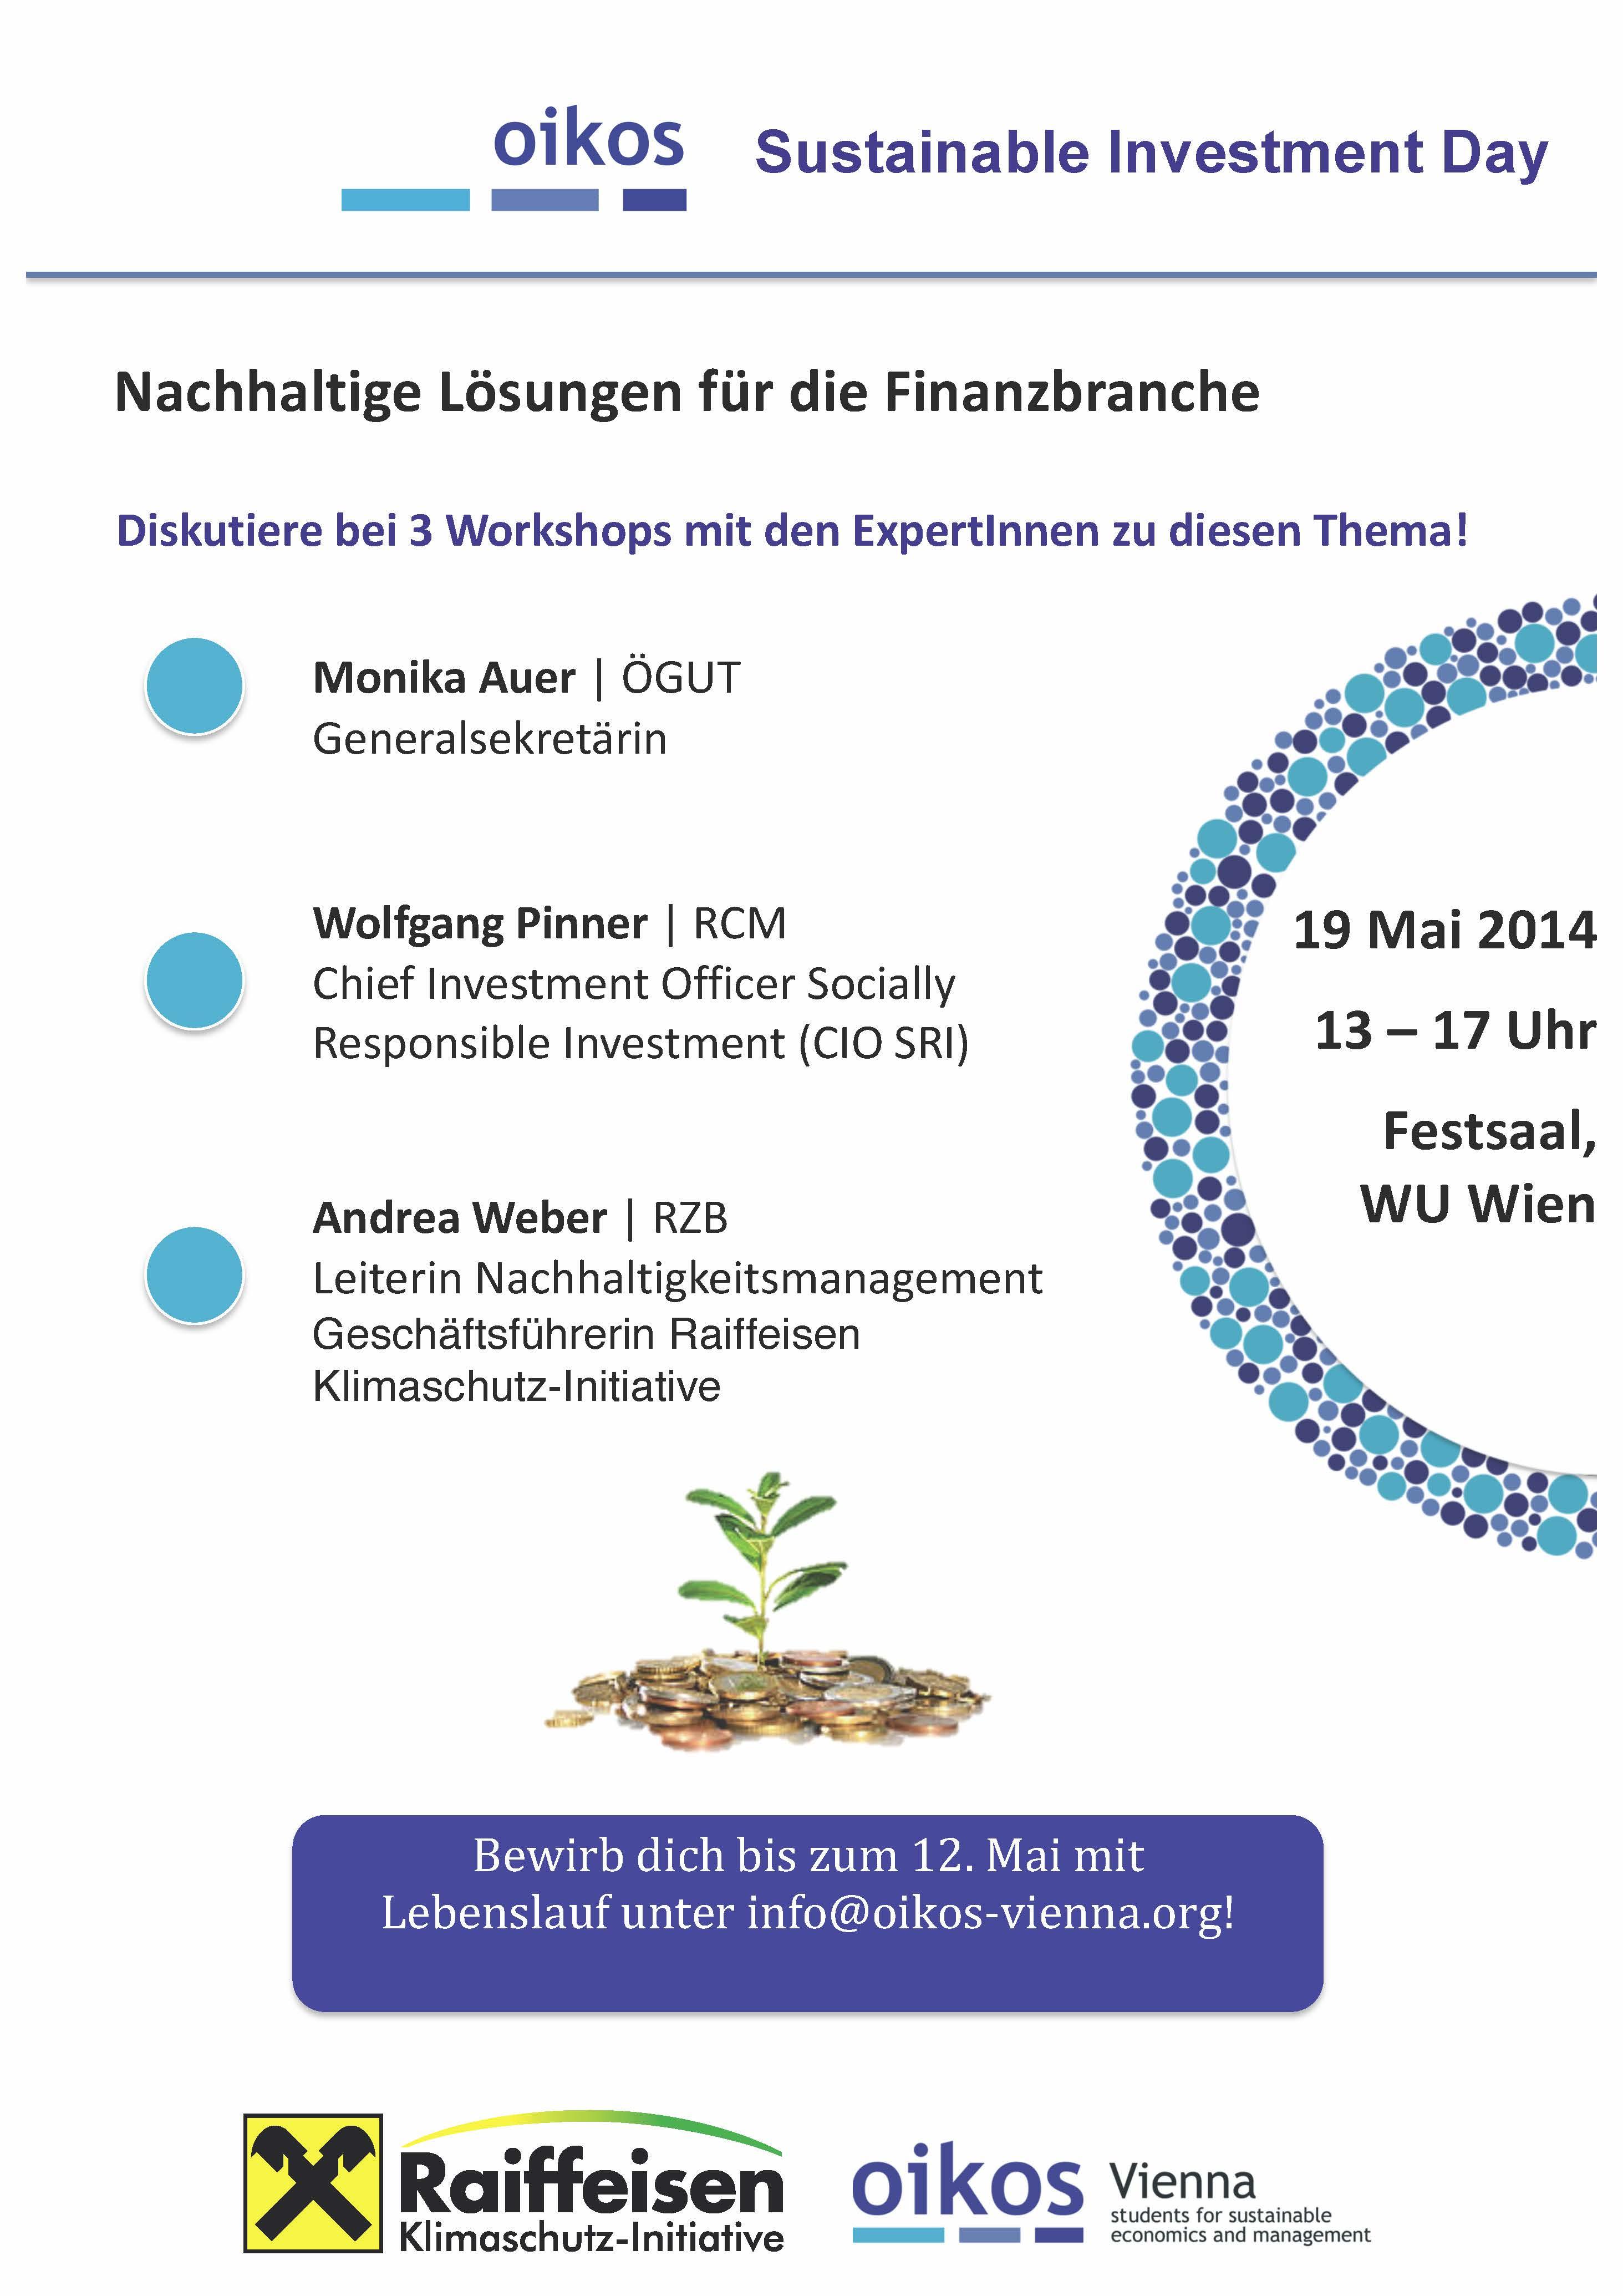 Vienna » Blog Archive oikos sustainable investment day 2014 - Vienna